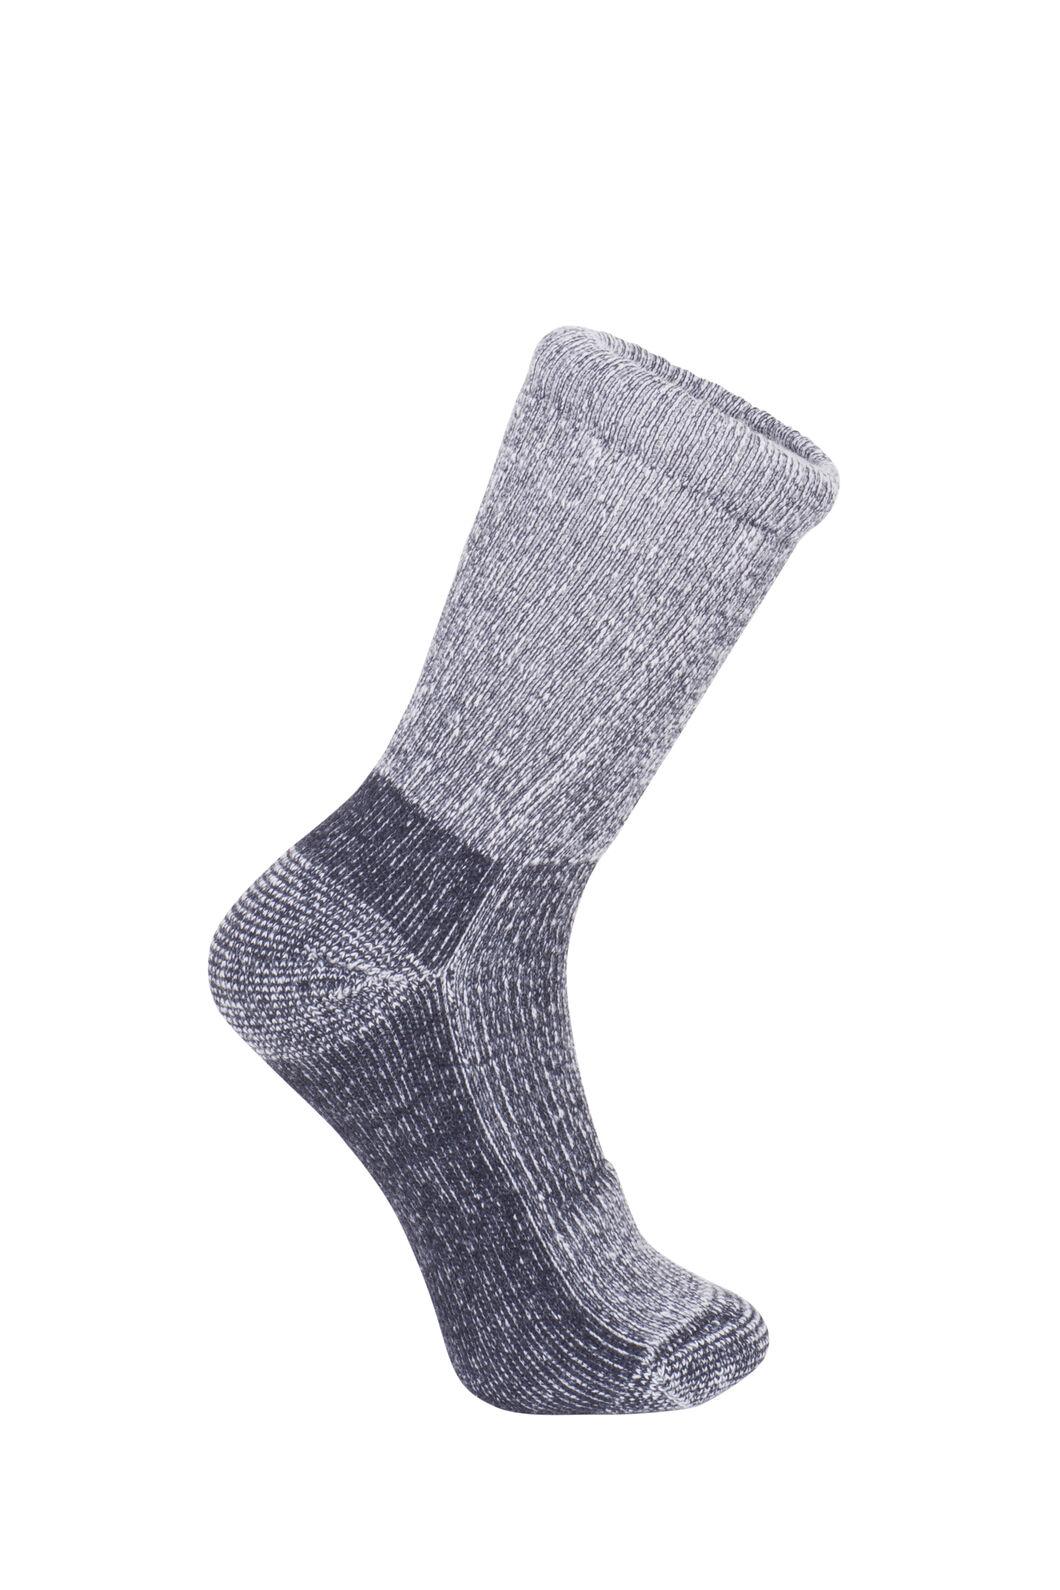 Macpac Winter Hiker Socks - Kids', Black, hi-res